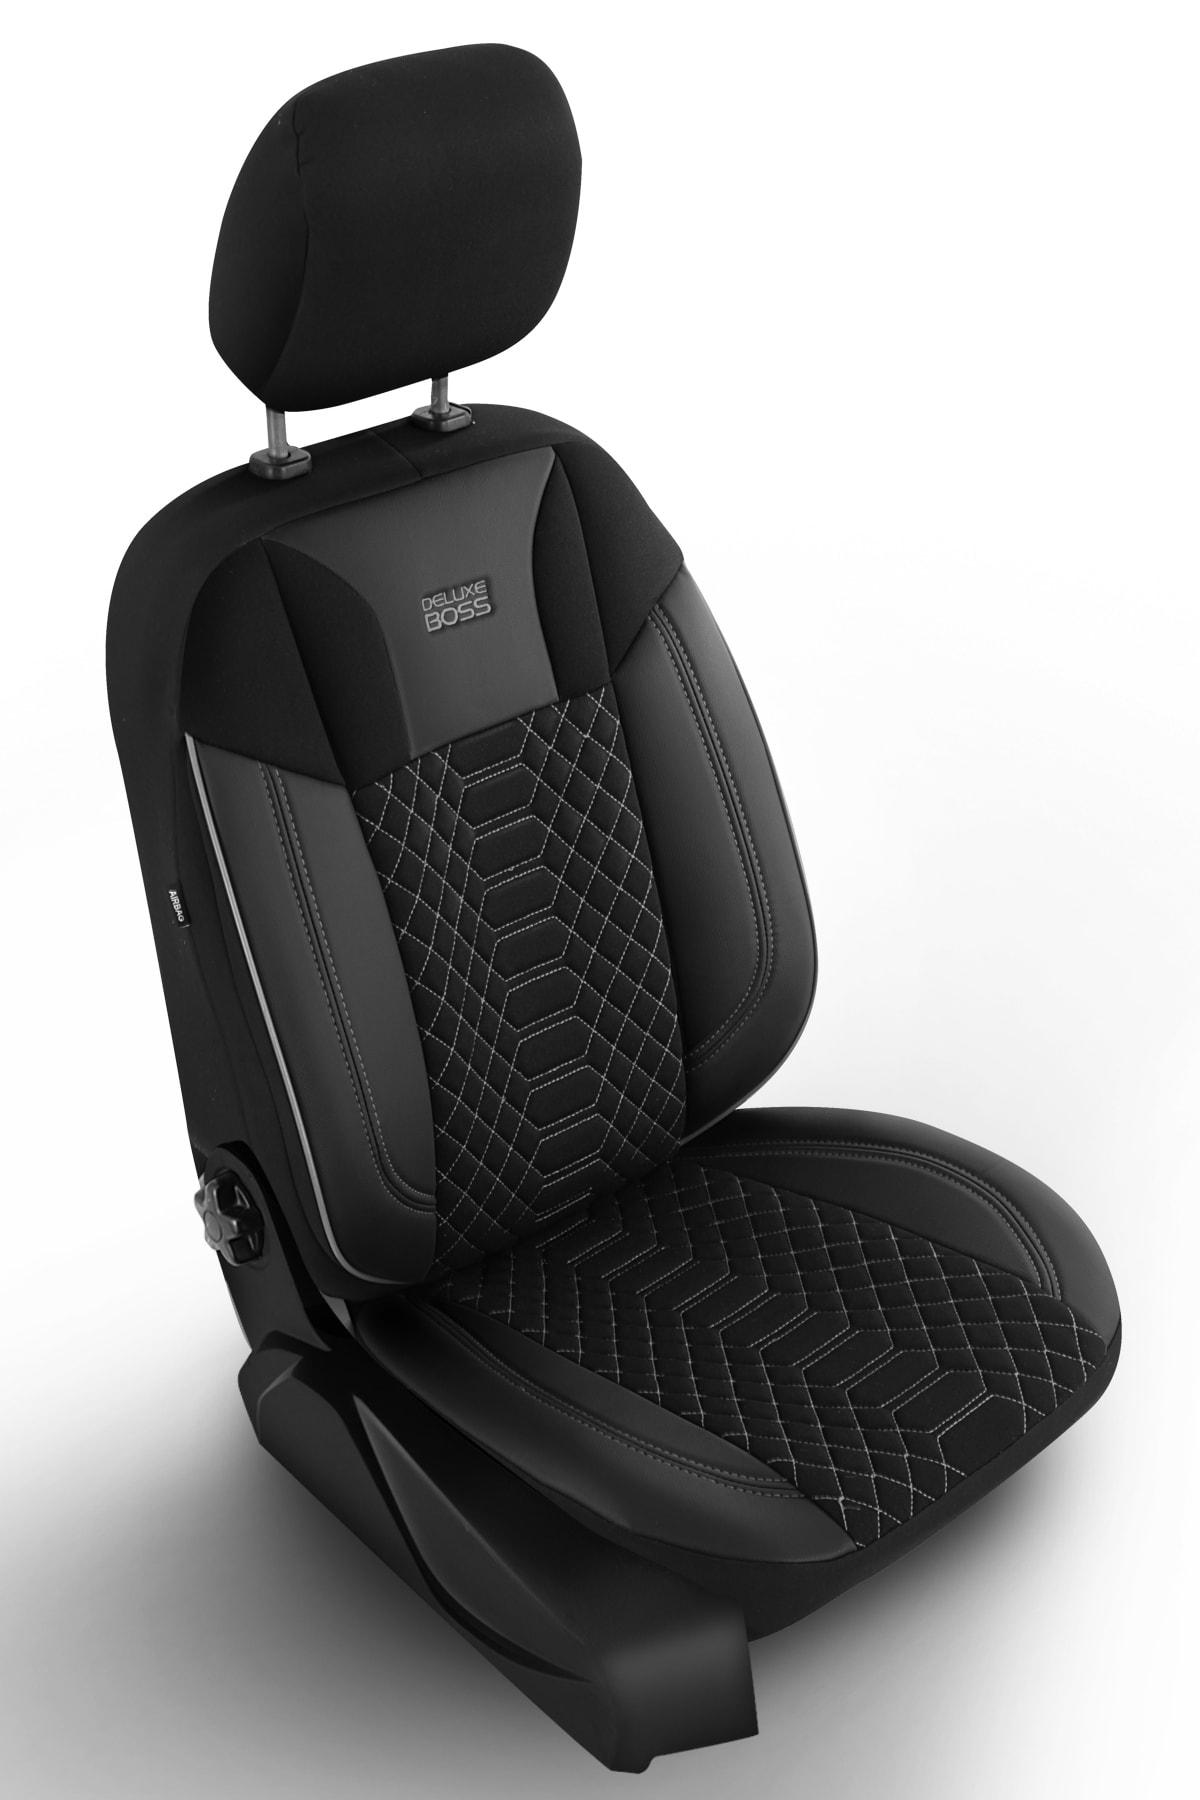 Deluxe Boss Special Oto Koltuk Kılıfı - Modena Serisi - Siyah Renk Füme Nakış 1